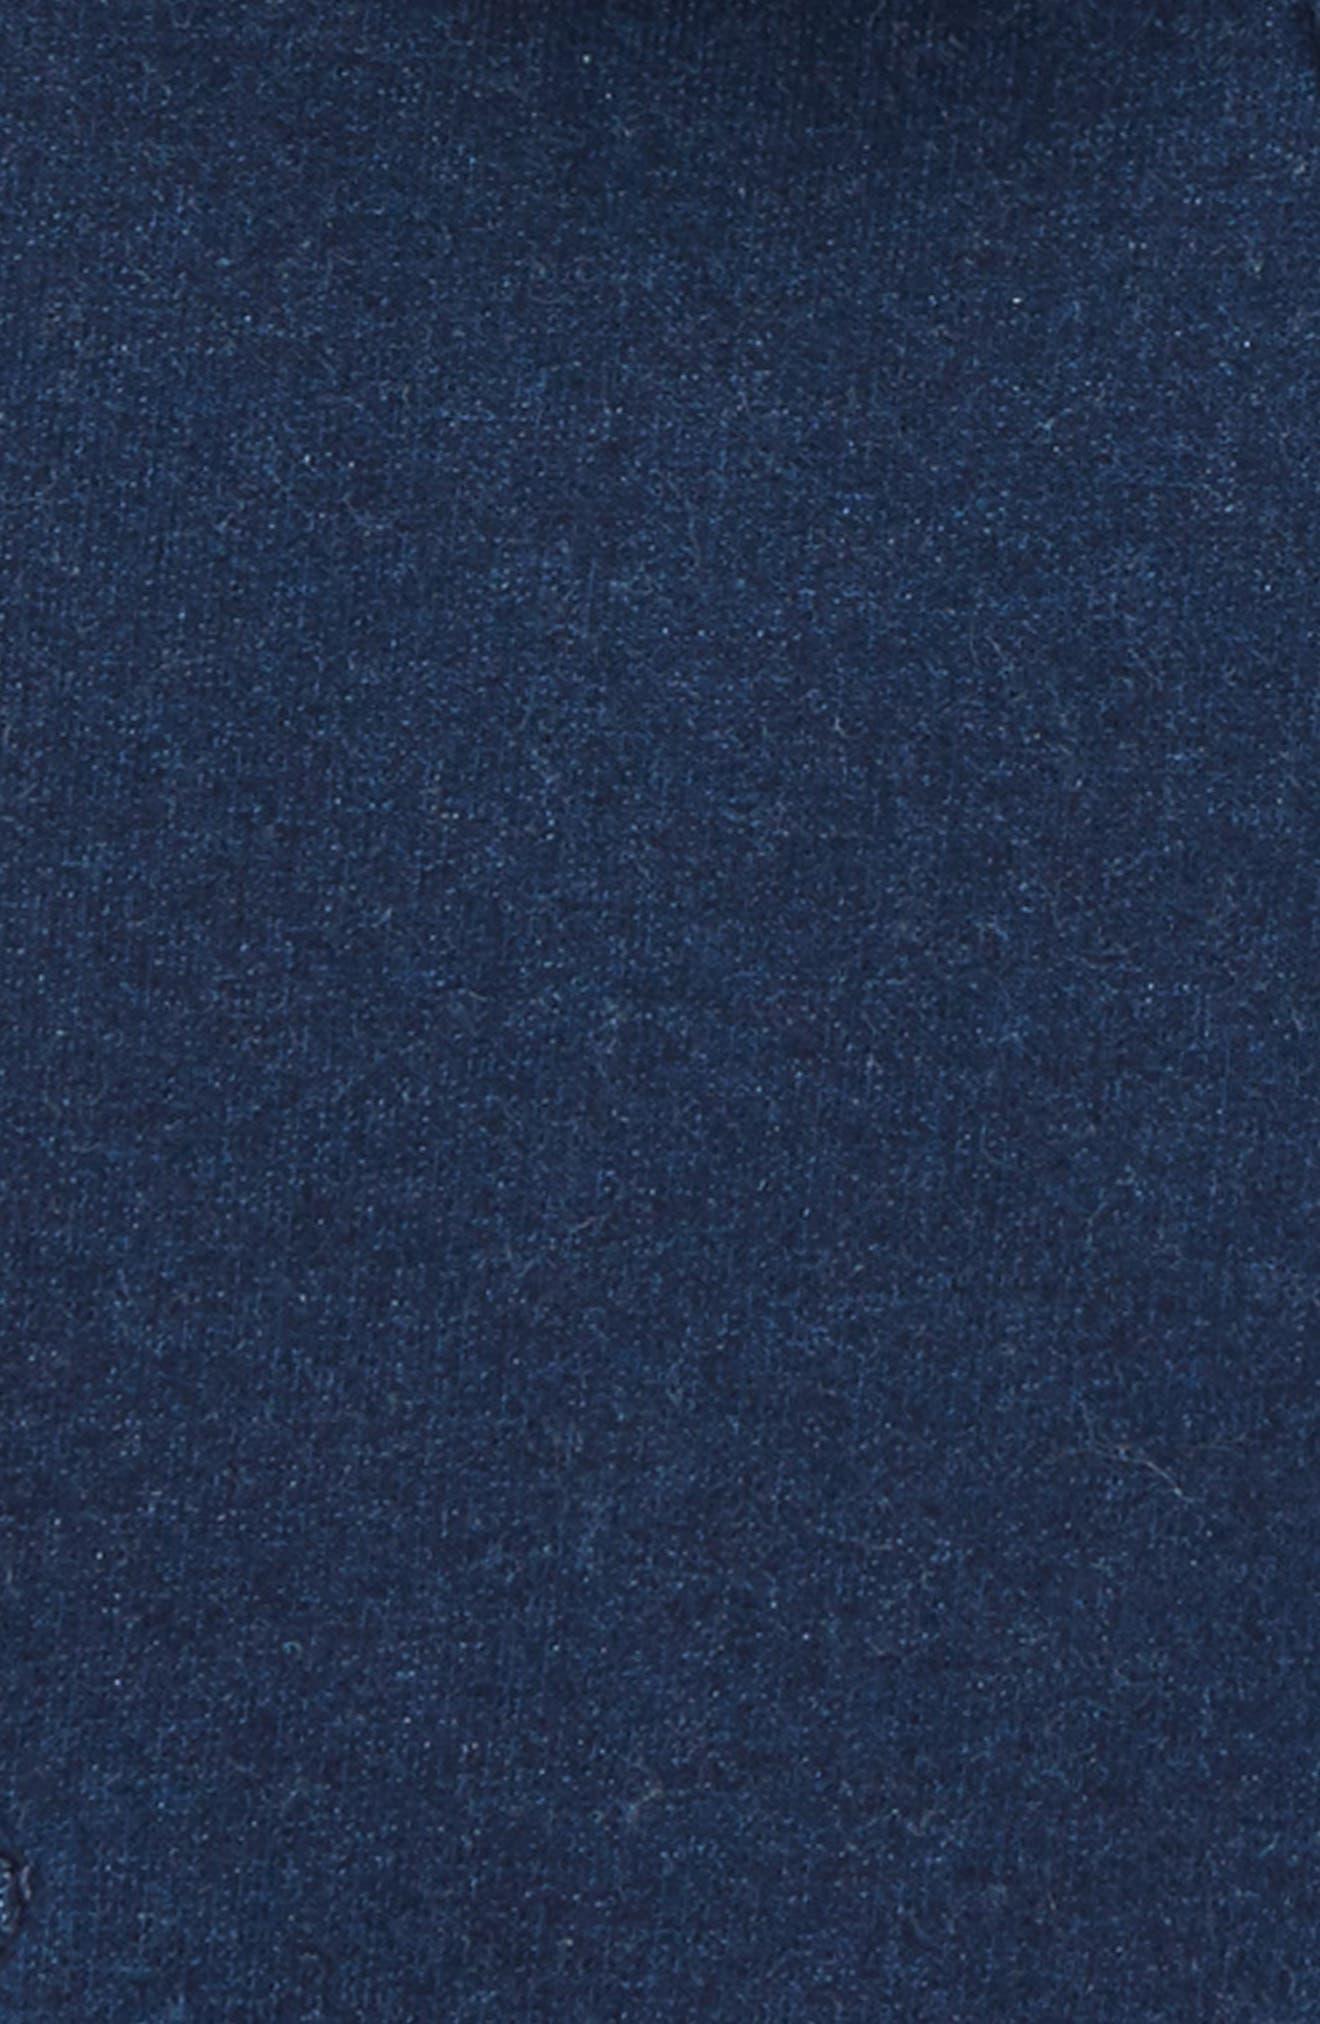 Indigo Moto Jacket,                             Alternate thumbnail 2, color,                             400